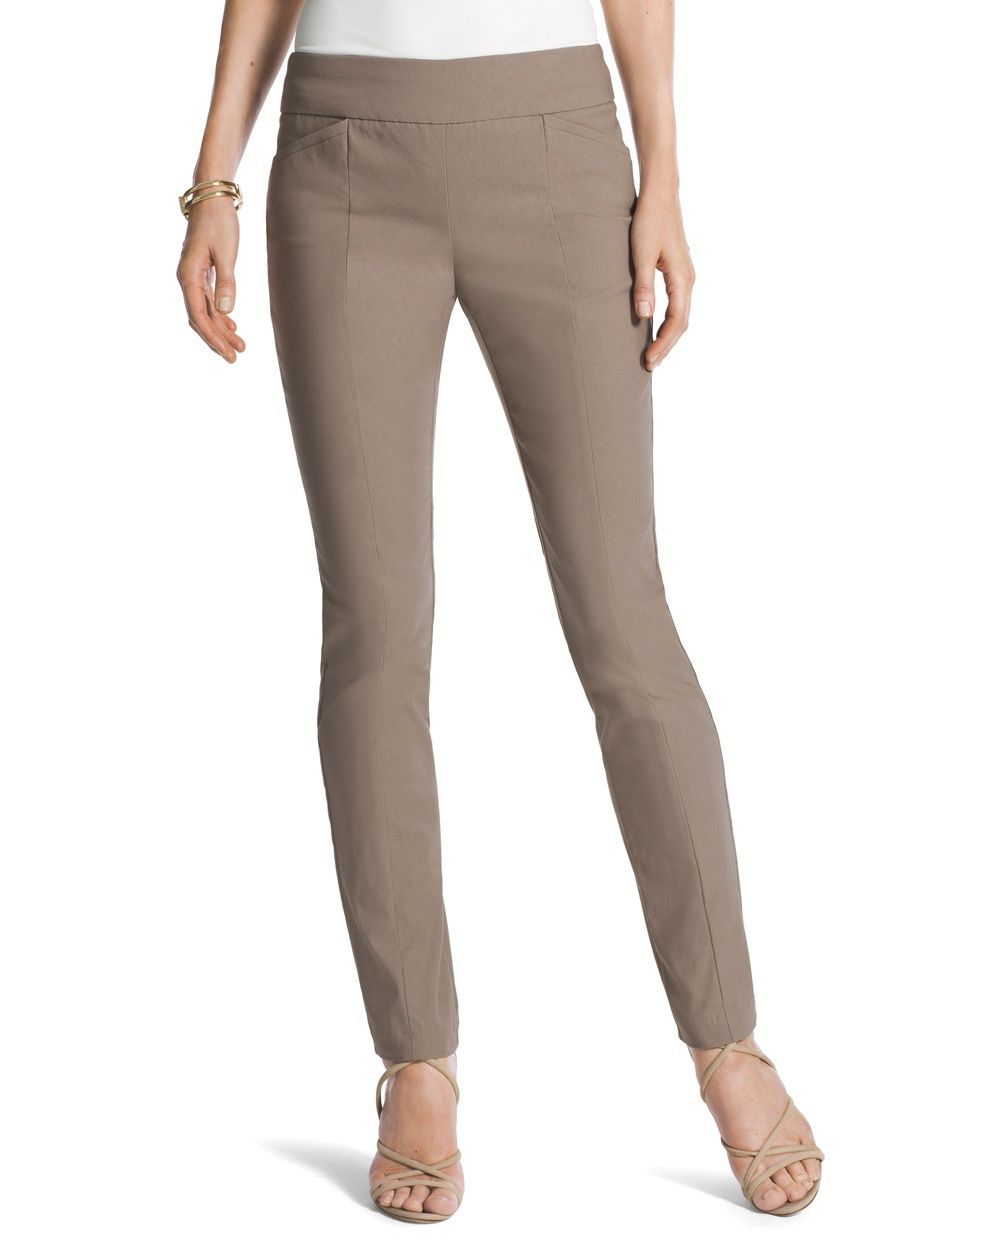 413fb8662719 Chico's Women's So Slimming Brigitte Pants, Talpa Taupe, Size: 2.5 (14 - L)